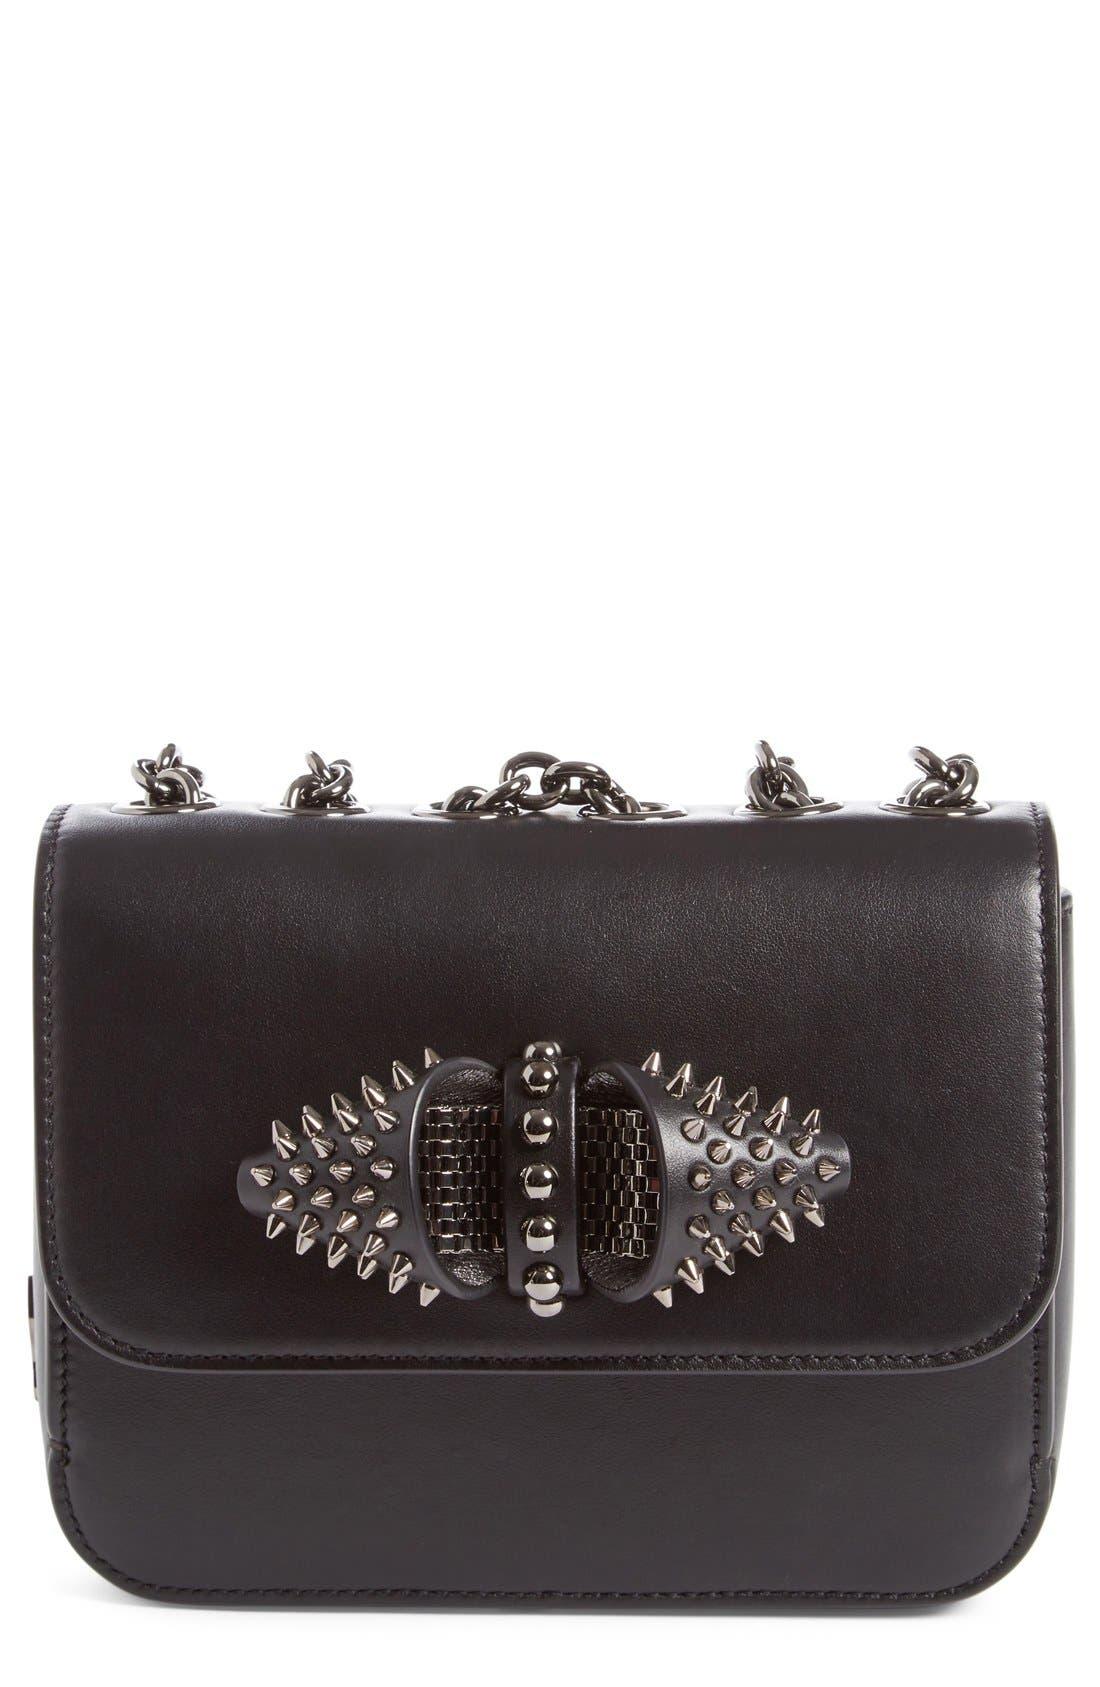 Christian Louboutin 'Small Sweet Charity' Spiked Calfskin Shoulder/Crossbody Bag